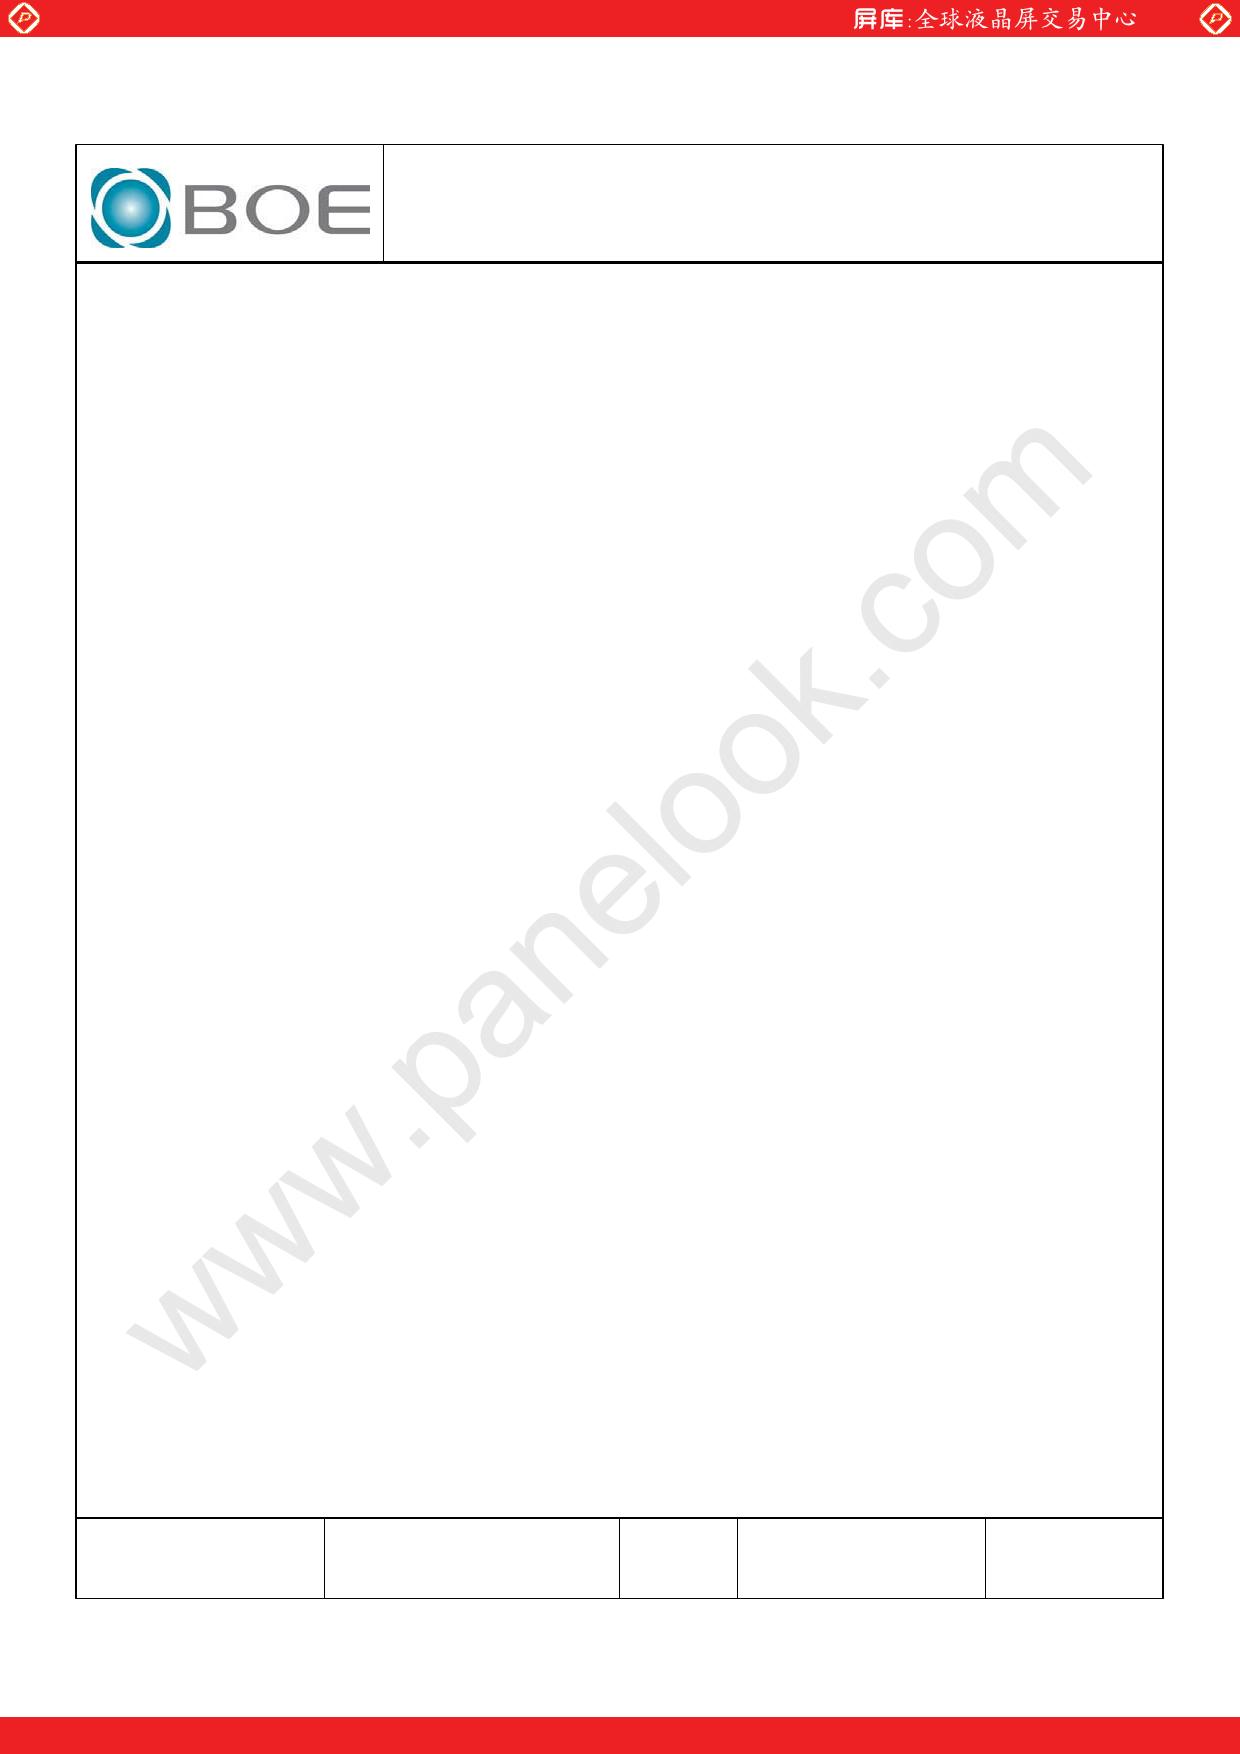 HV150UX1-102 Datasheet, HV150UX1-102 PDF,ピン配置, 機能